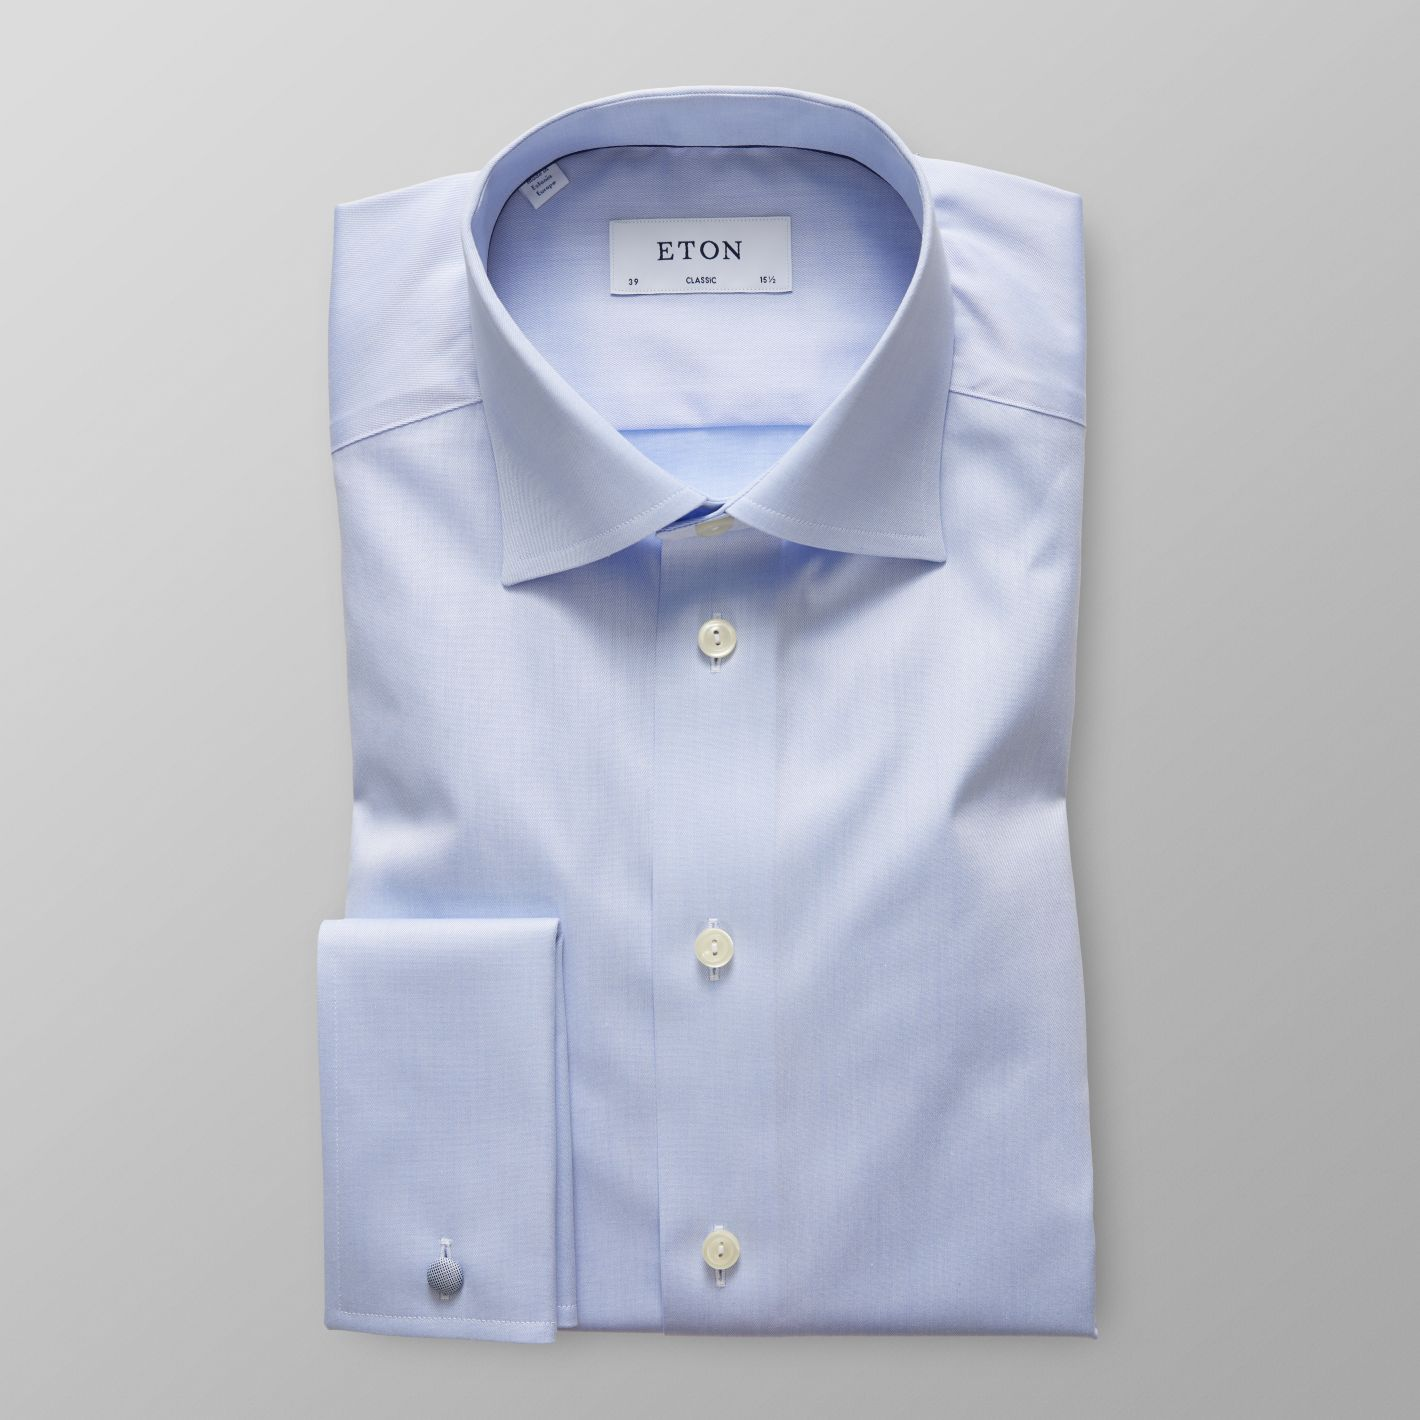 Light Blue French Cuff Shirt